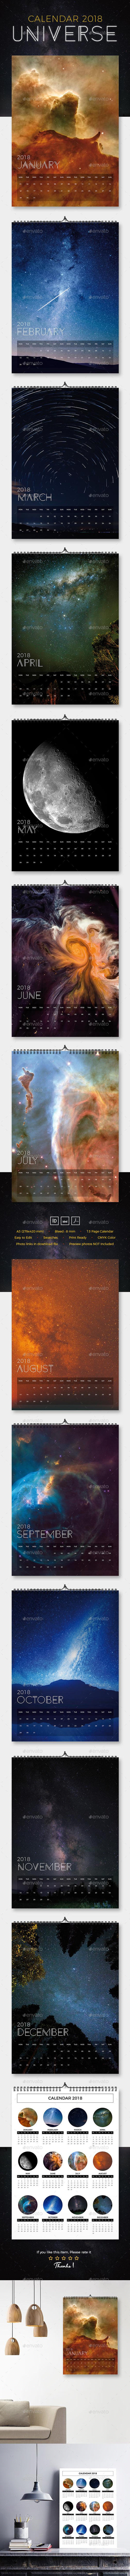 GraphicRiver Calendar 2018 Universe 20981865